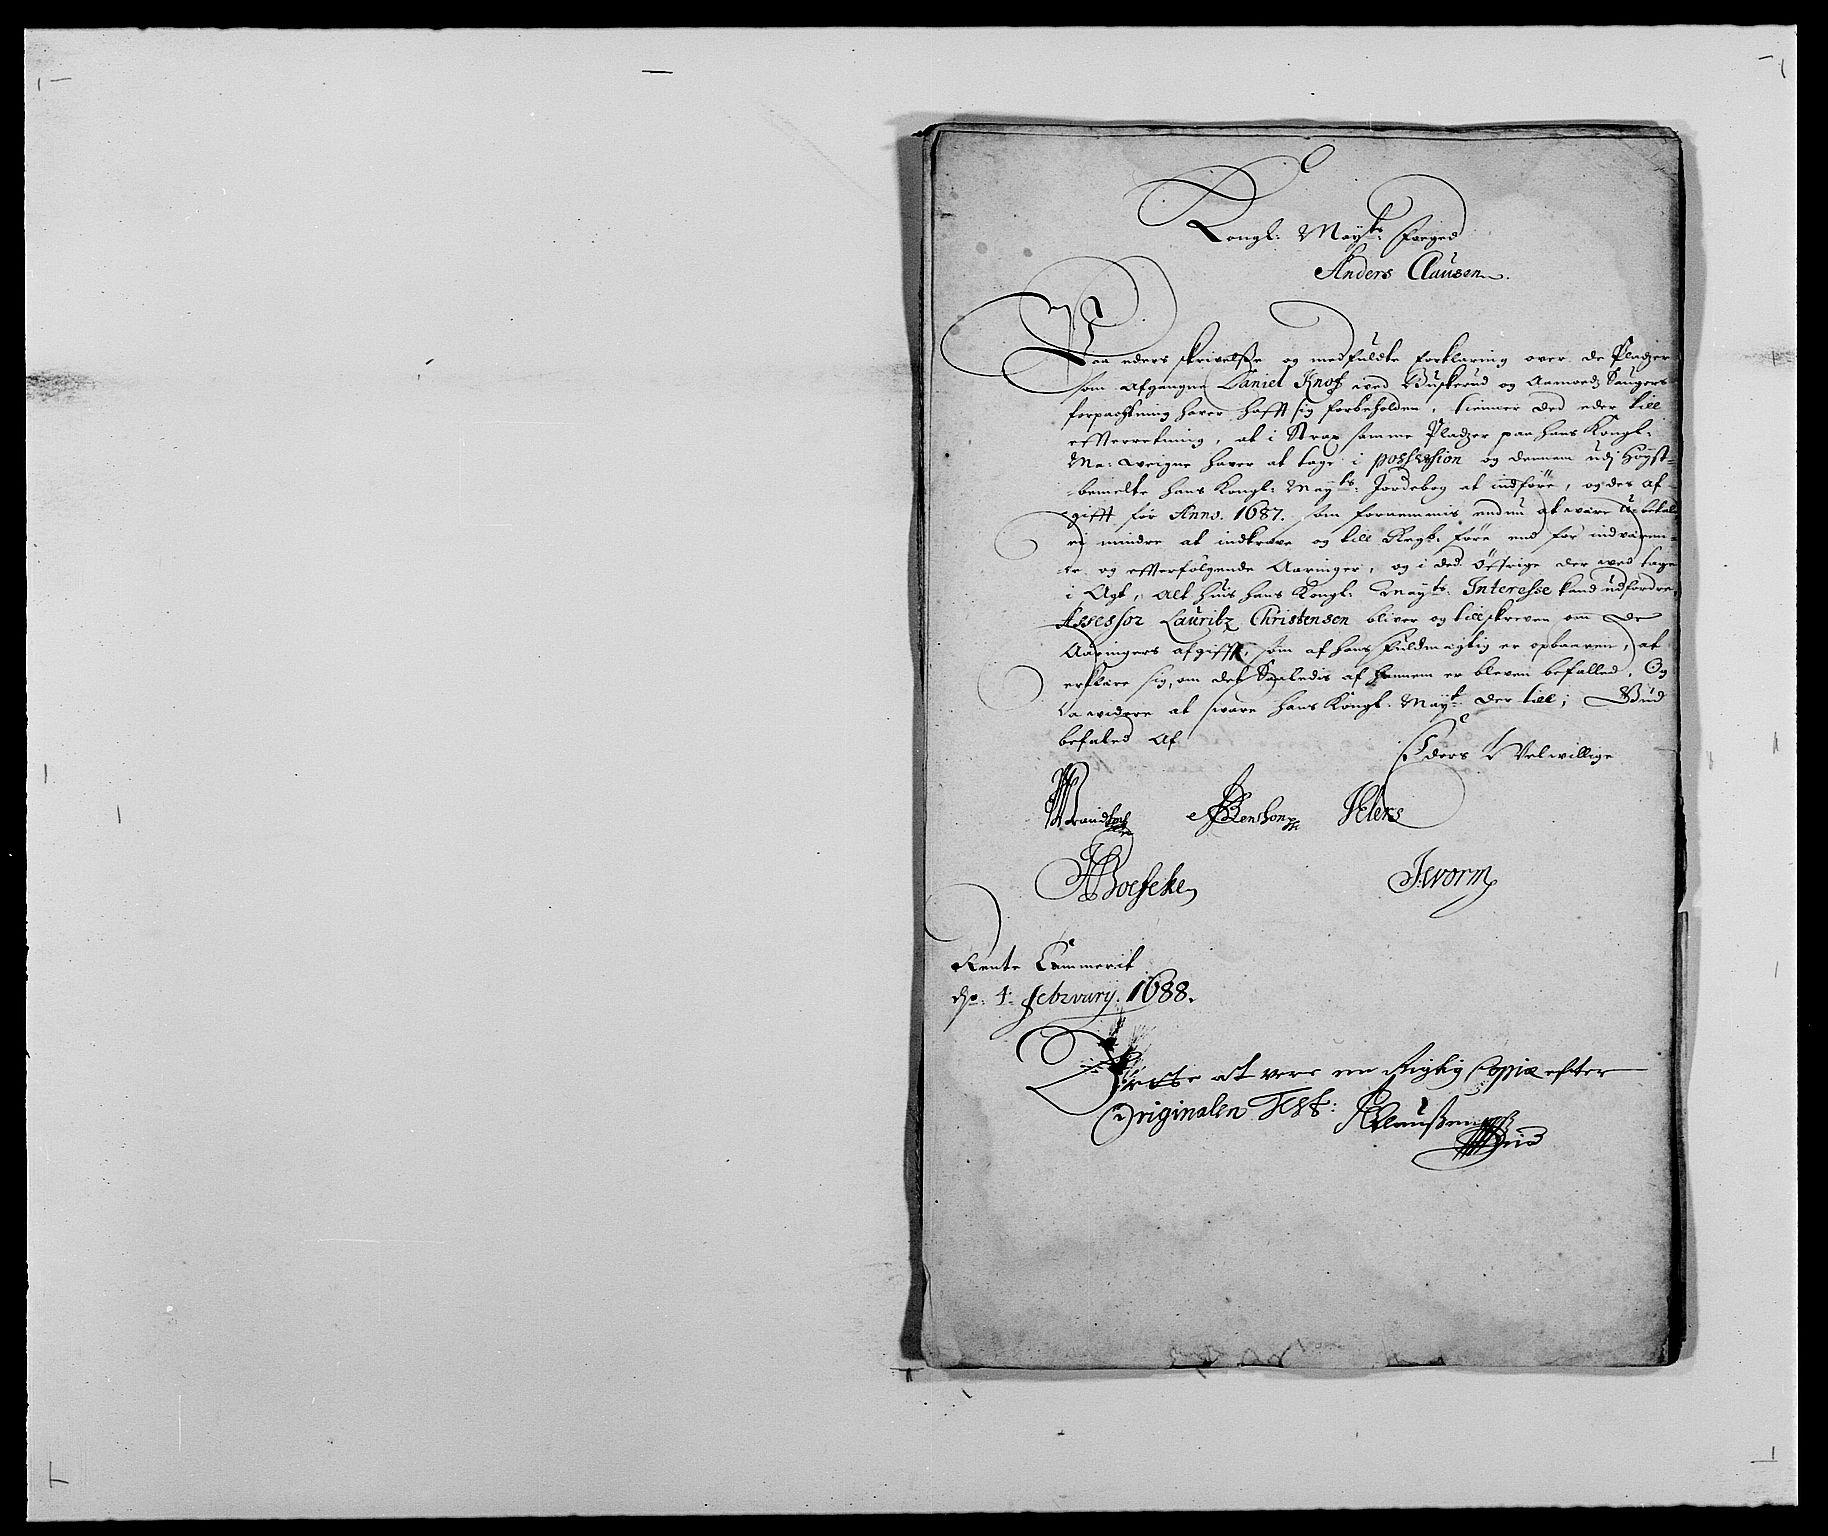 RA, Rentekammeret inntil 1814, Reviderte regnskaper, Fogderegnskap, R25/L1679: Fogderegnskap Buskerud, 1687-1688, s. 516